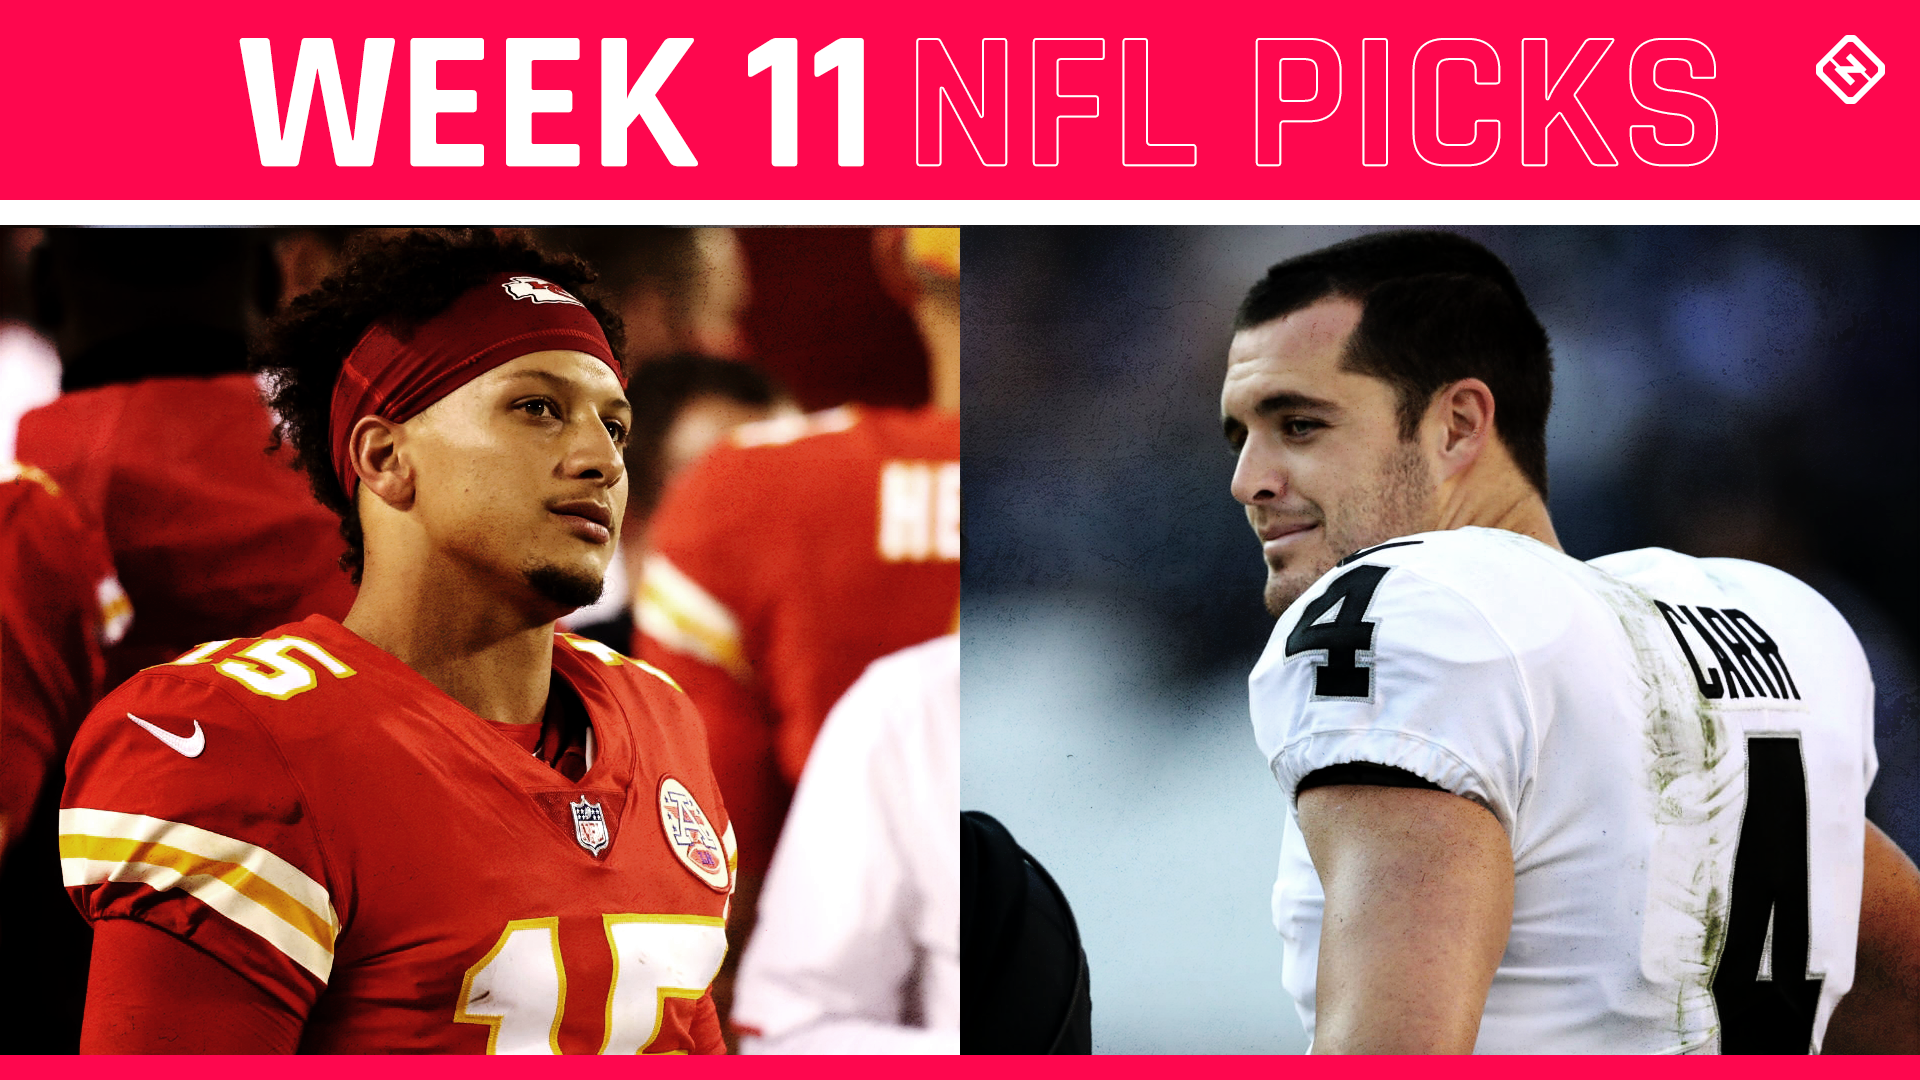 week 11 nfl picks pmdc